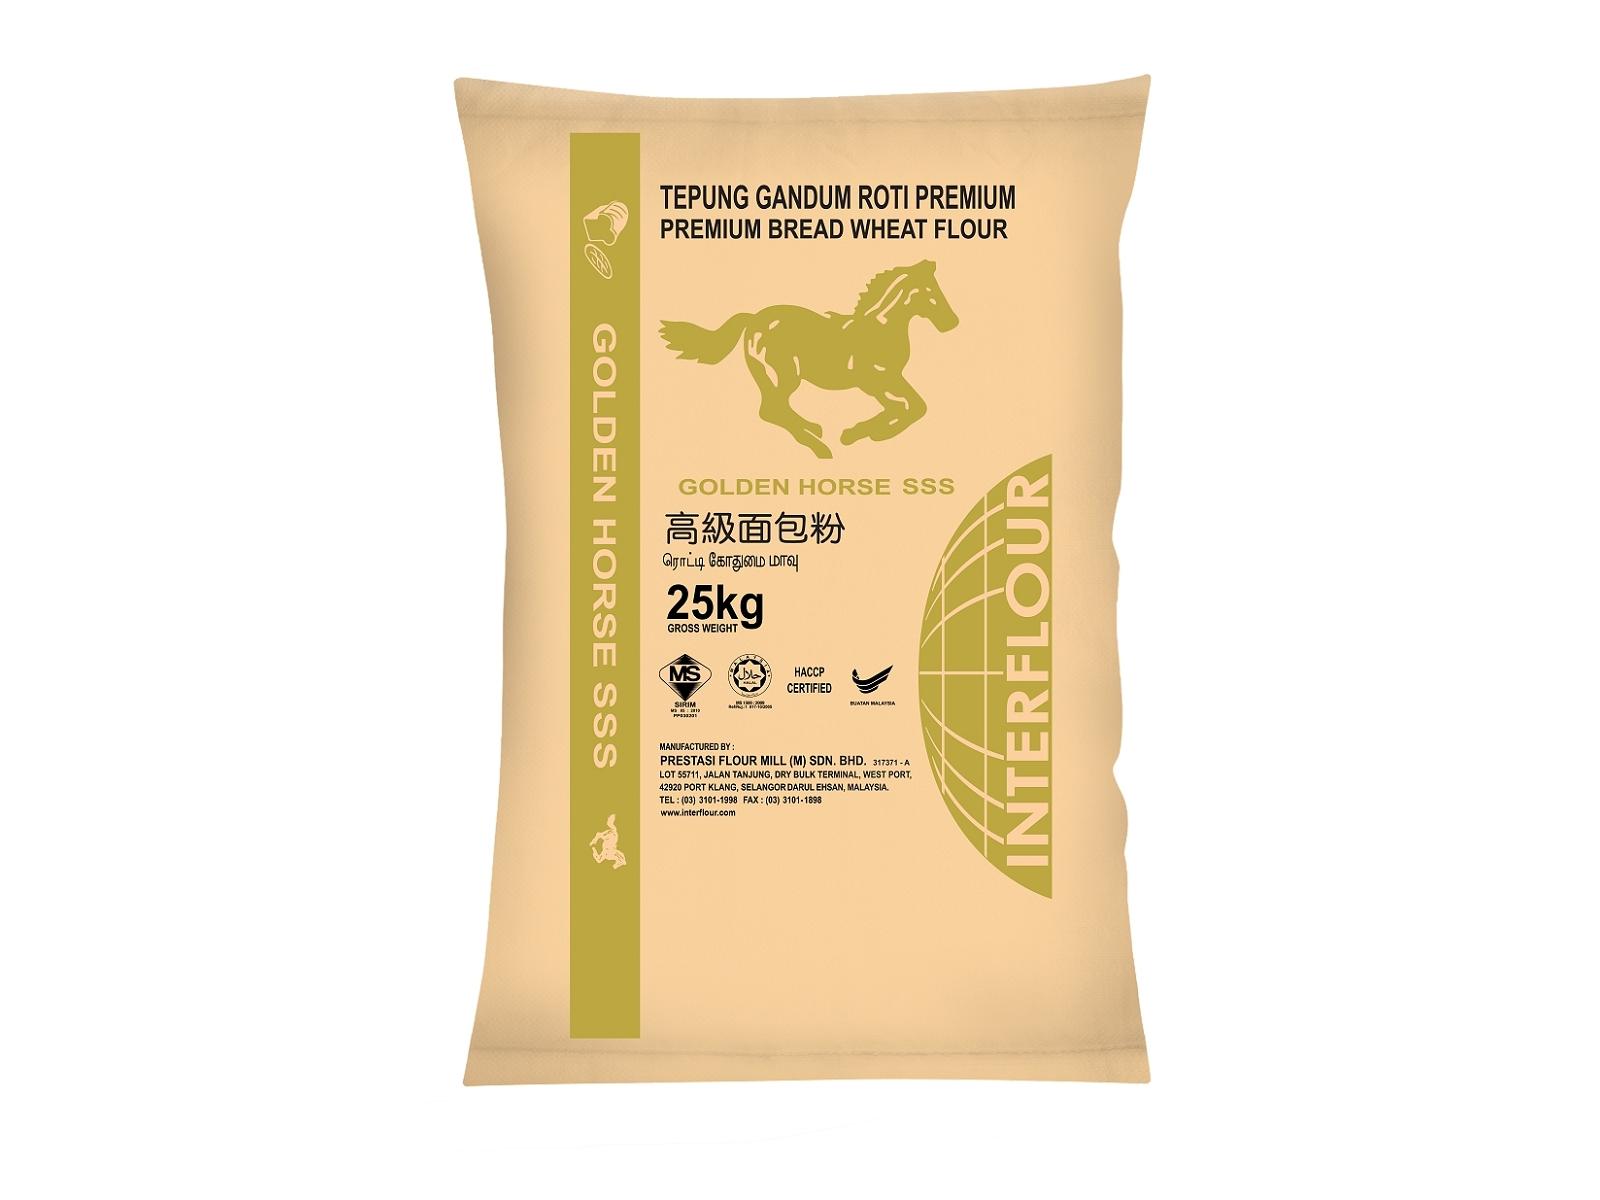 Golden Horse SSS Premium Bread FLour 25kg